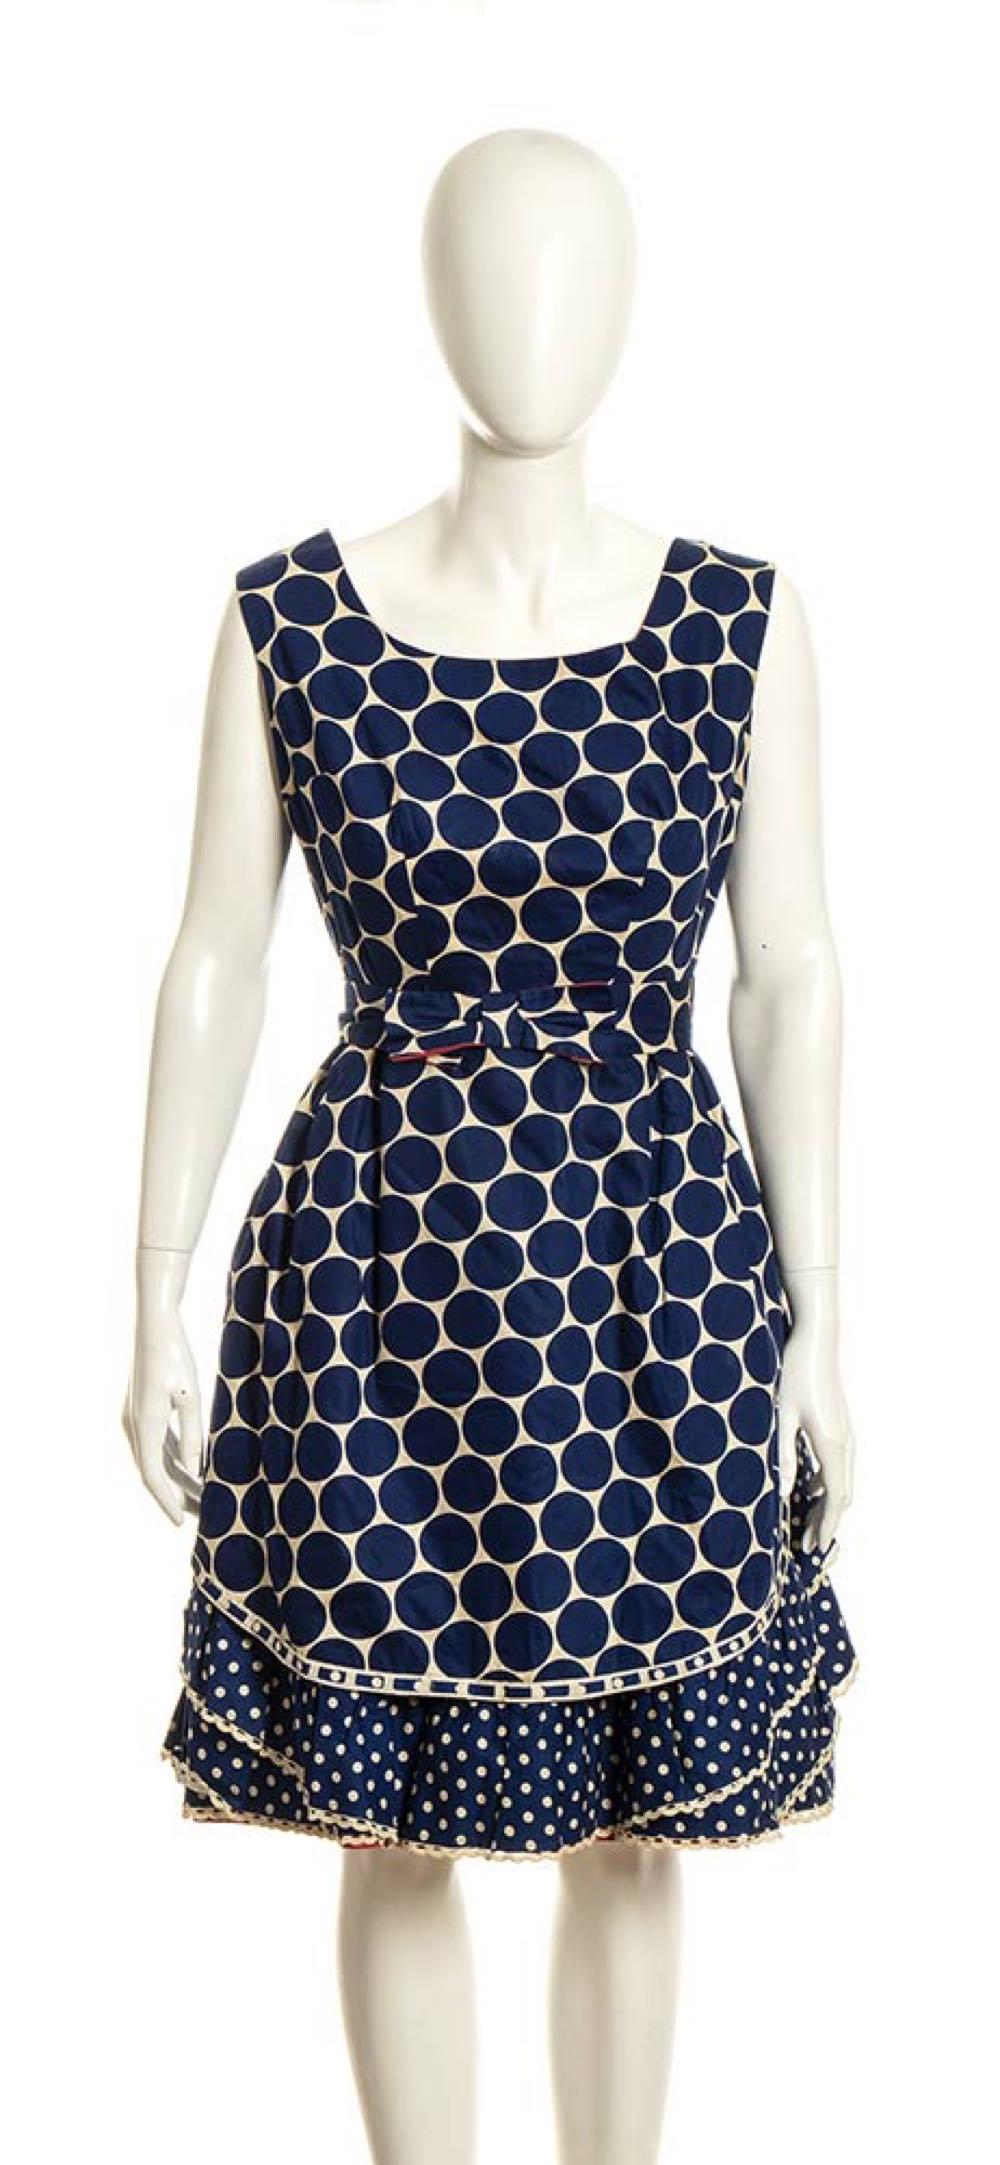 FERNANDA PANCANI - COTTON DRESS - 60s